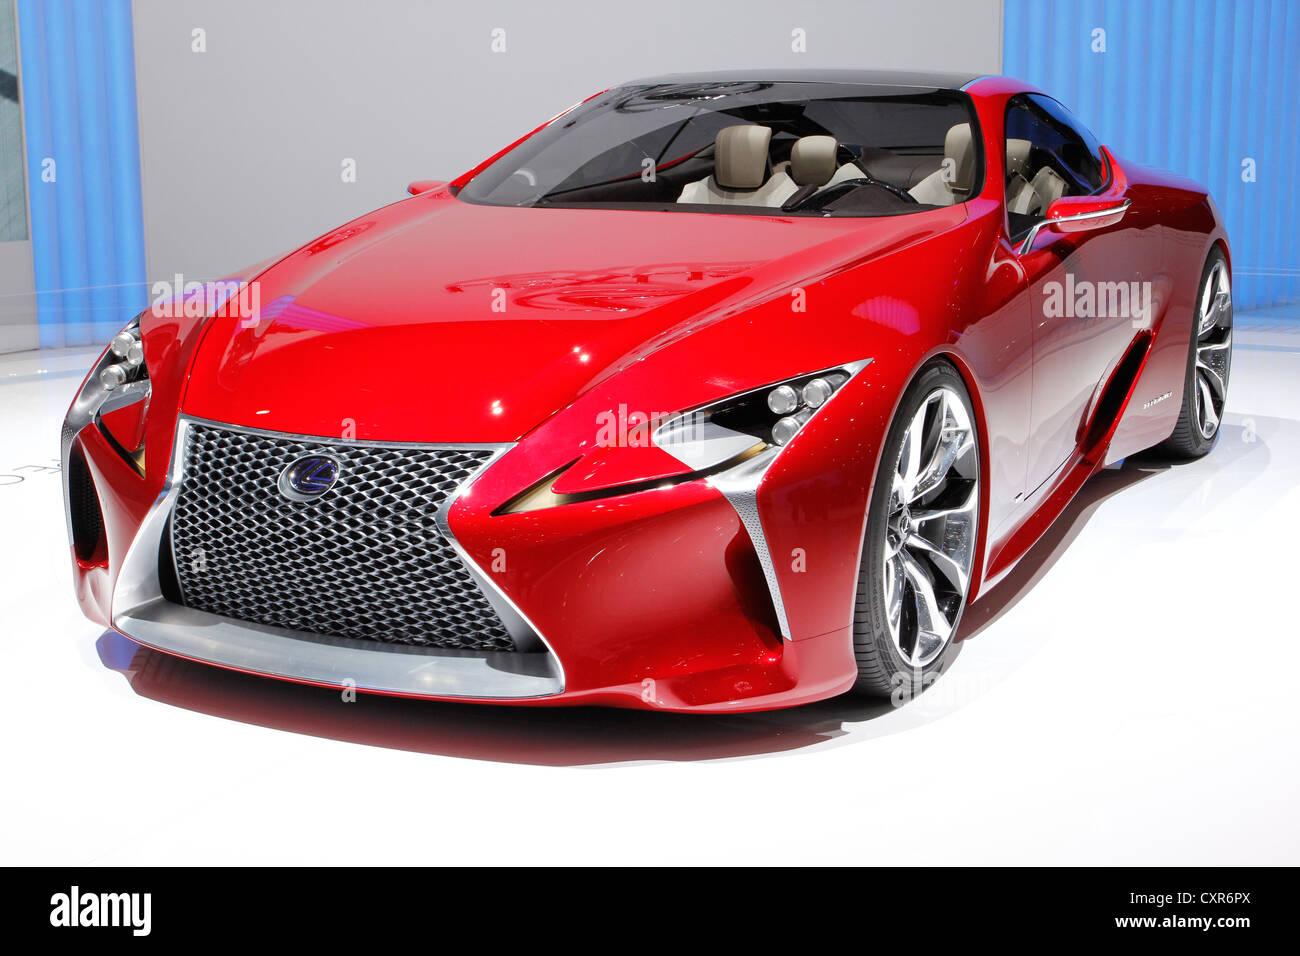 https://c8.alamy.com/comp/CXR6PX/lexus-lf-lc-new-presentation-concept-car-study-geneva-motor-show-2012-CXR6PX.jpg